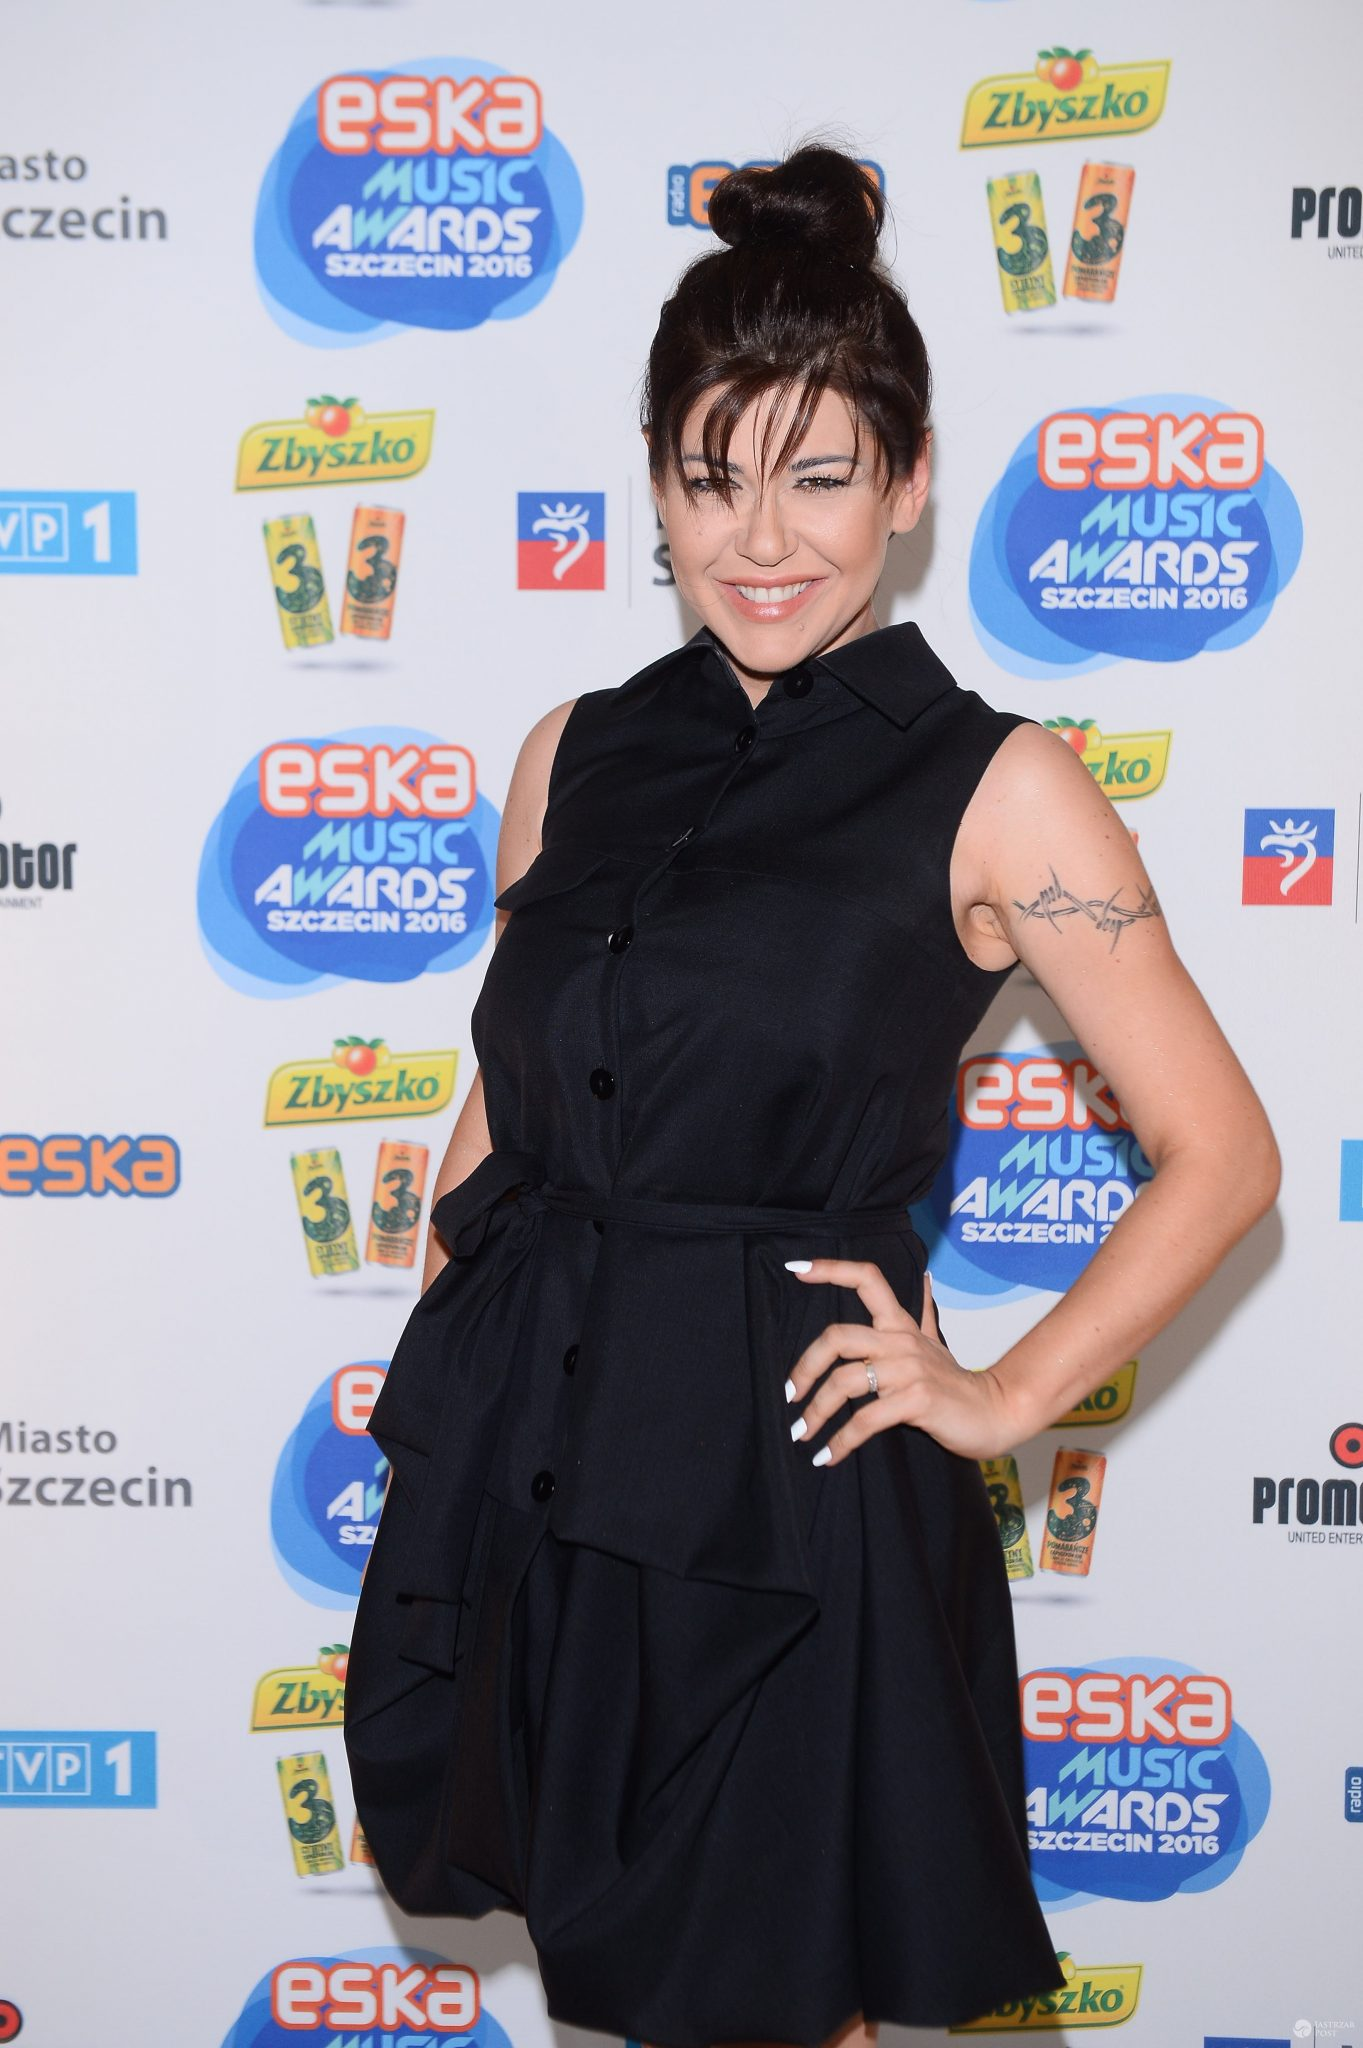 Skromna Iwona Węgrowska na ESKA Music Awards 2016